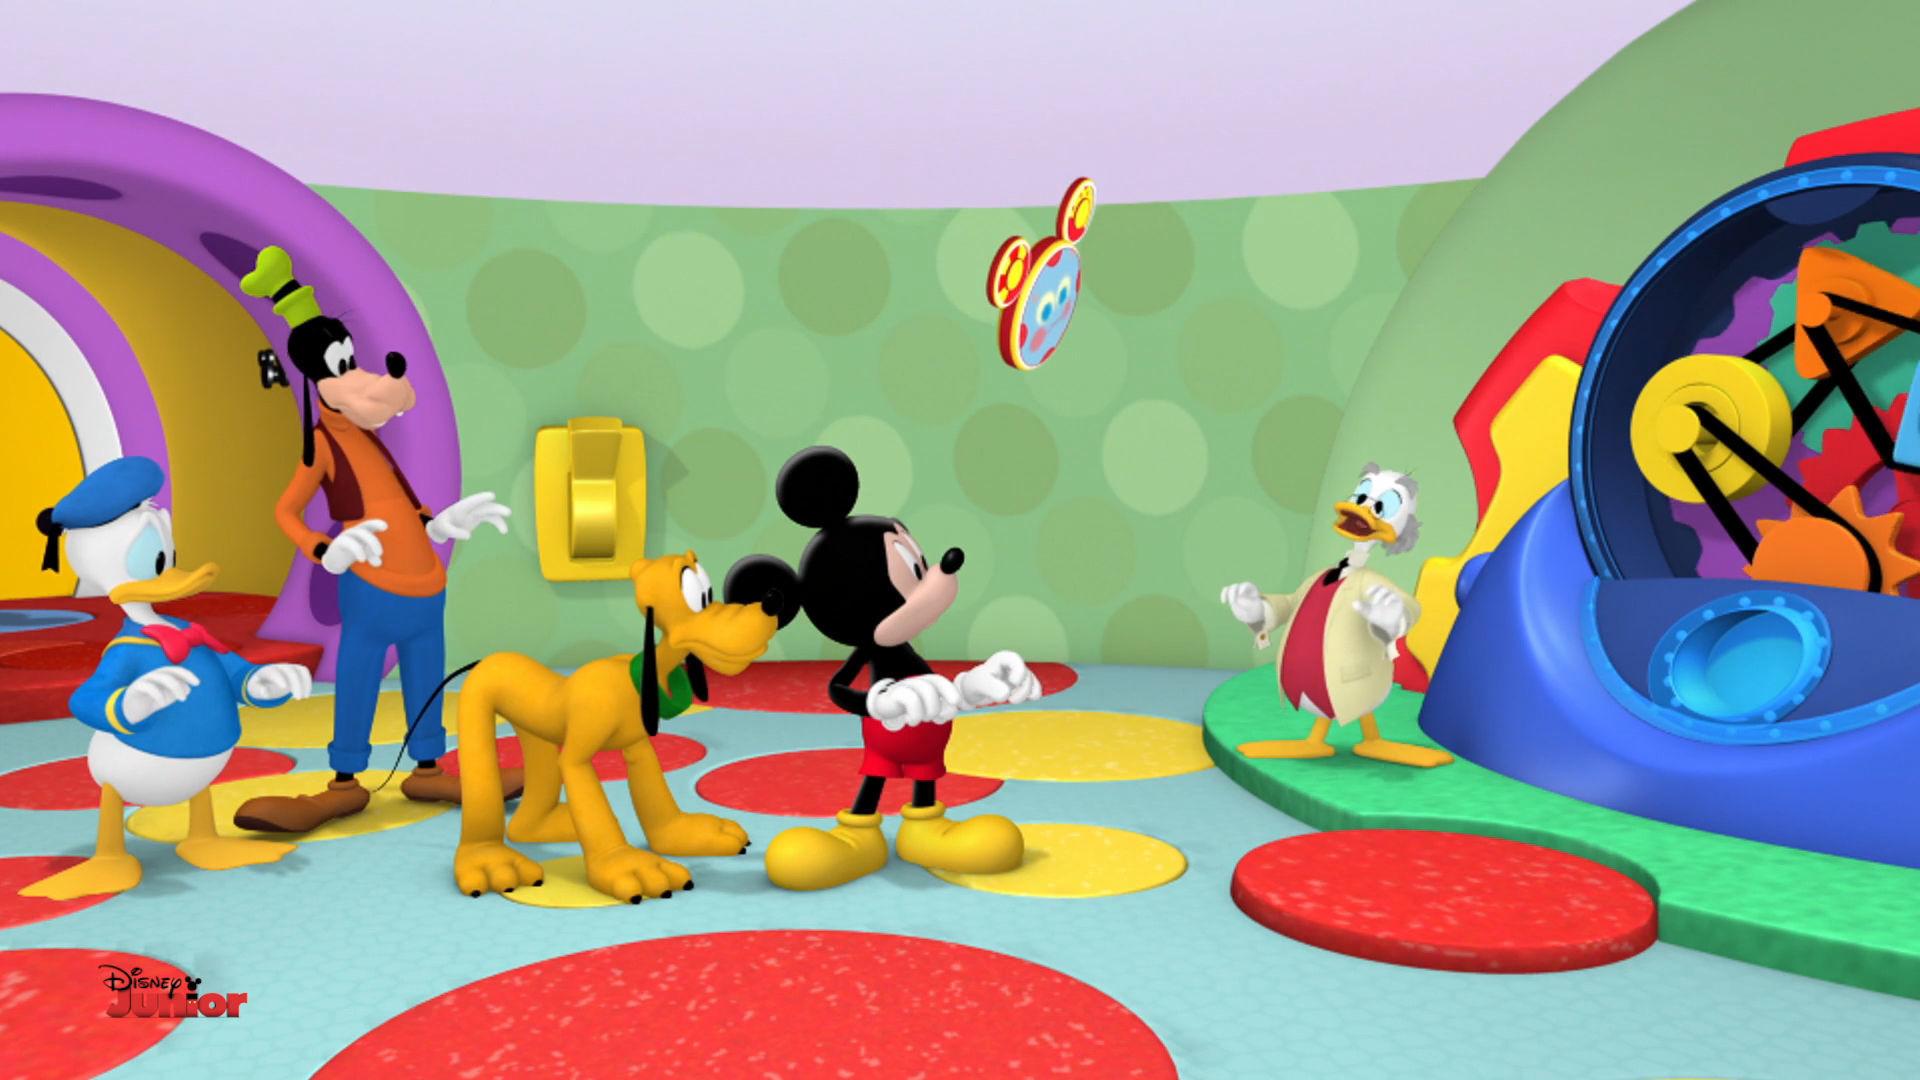 L'aventure incroyable de Mickey